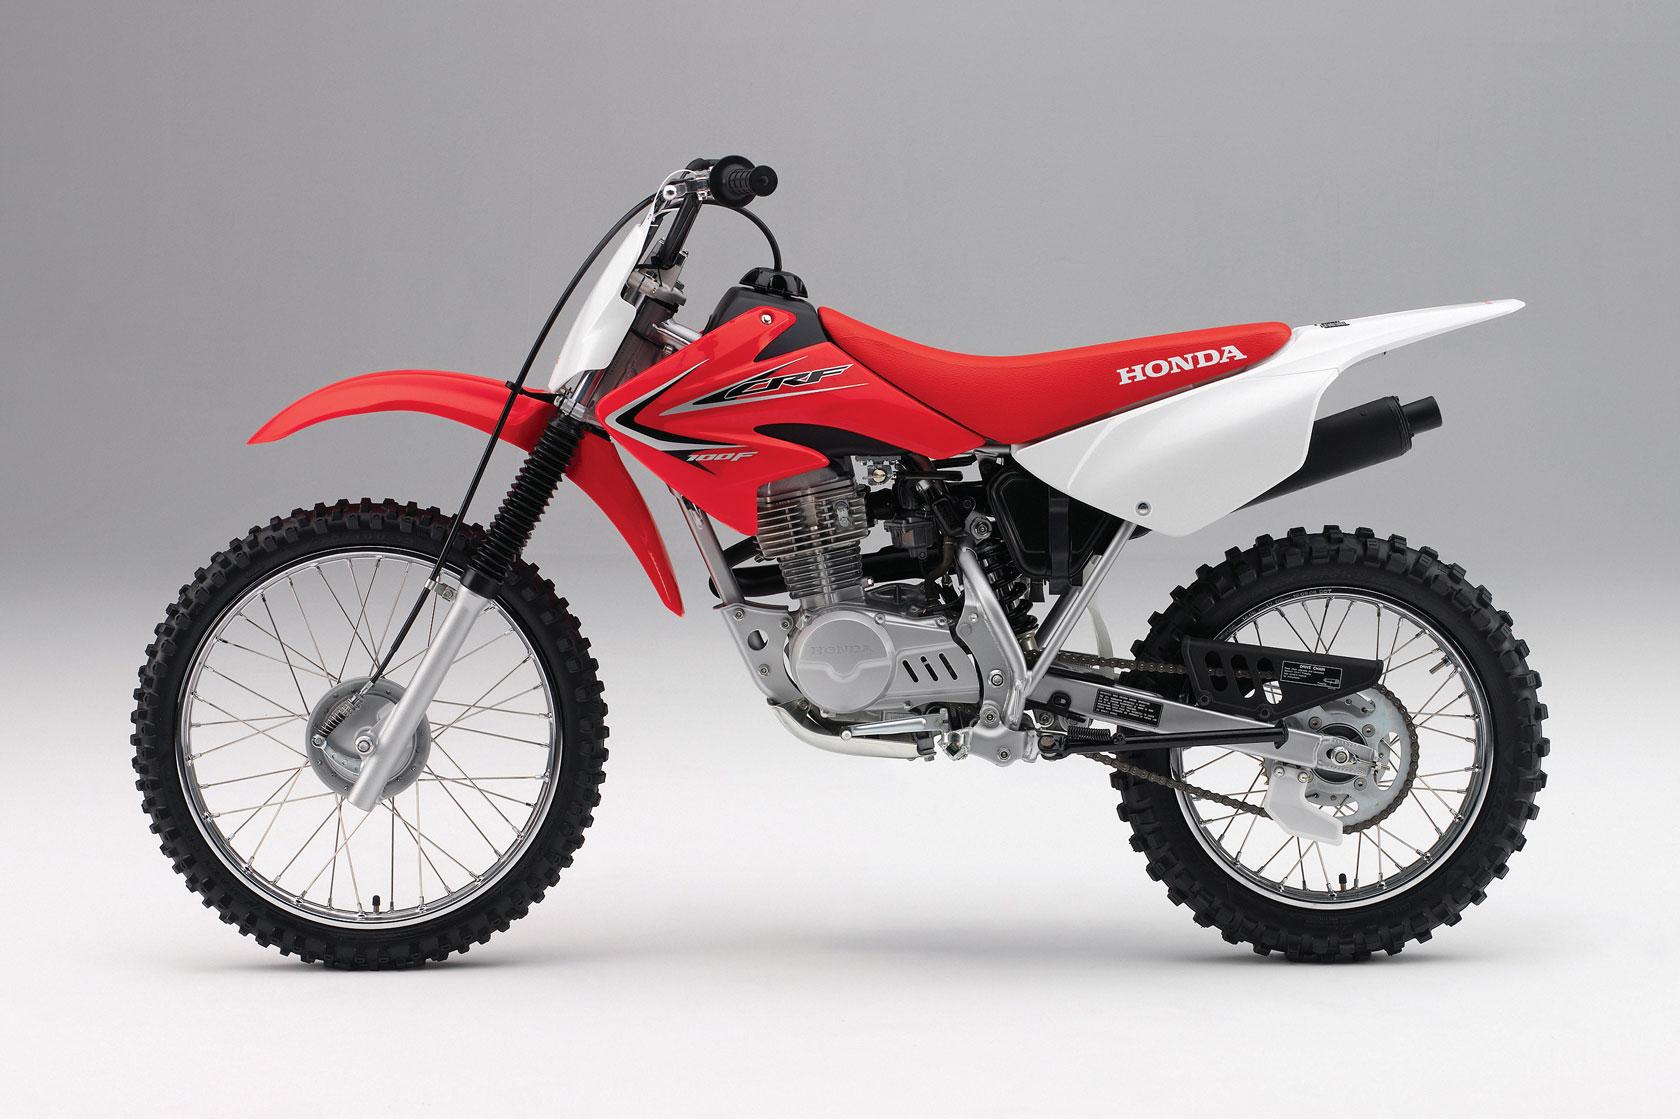 Honda Motorcycle Crff New Motorcycles Specs Price 242855 Wallpaper wallpaper